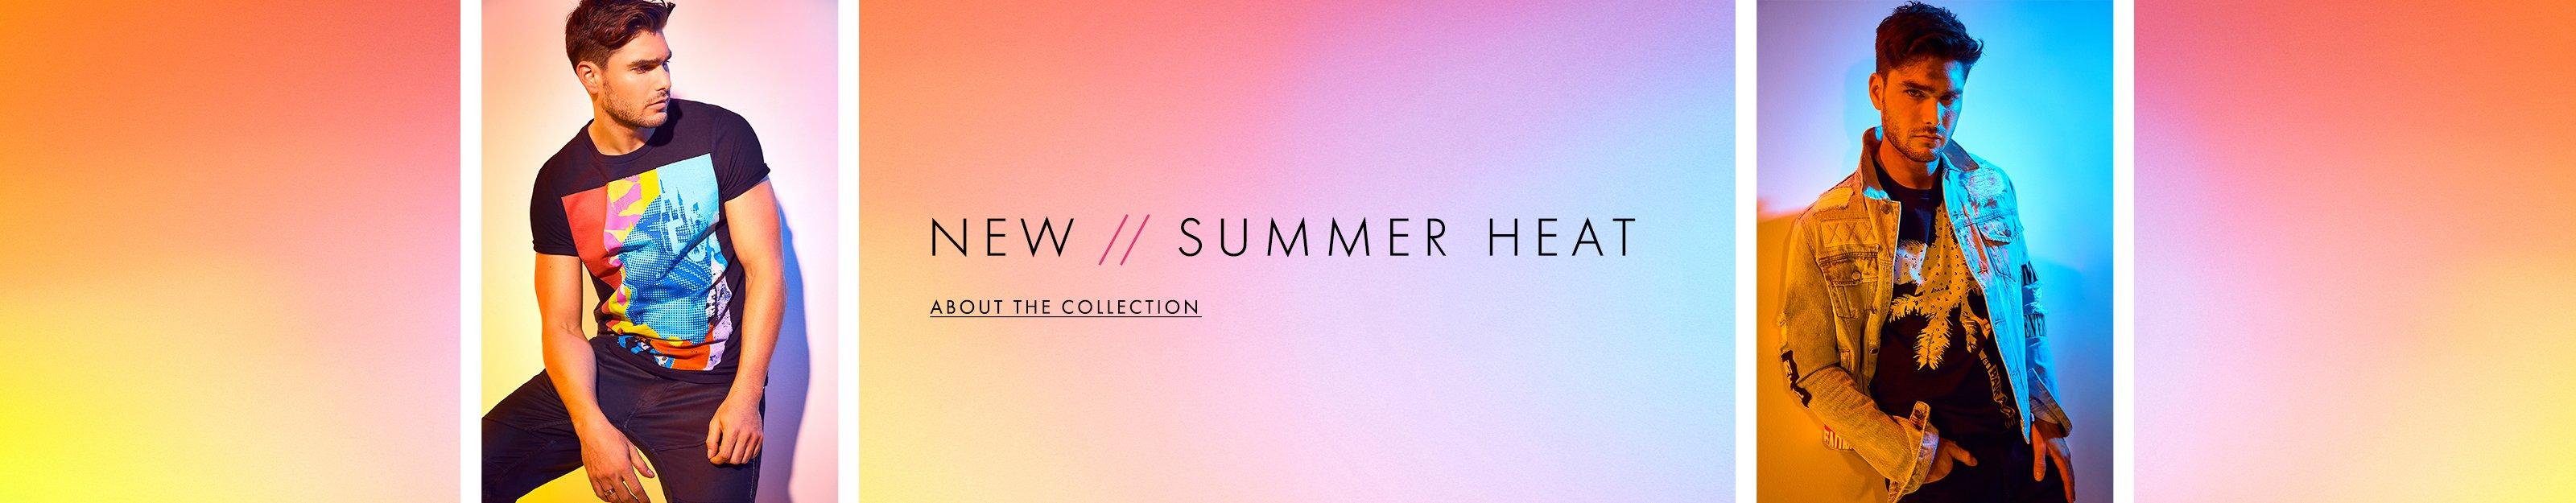 New Summer Heat